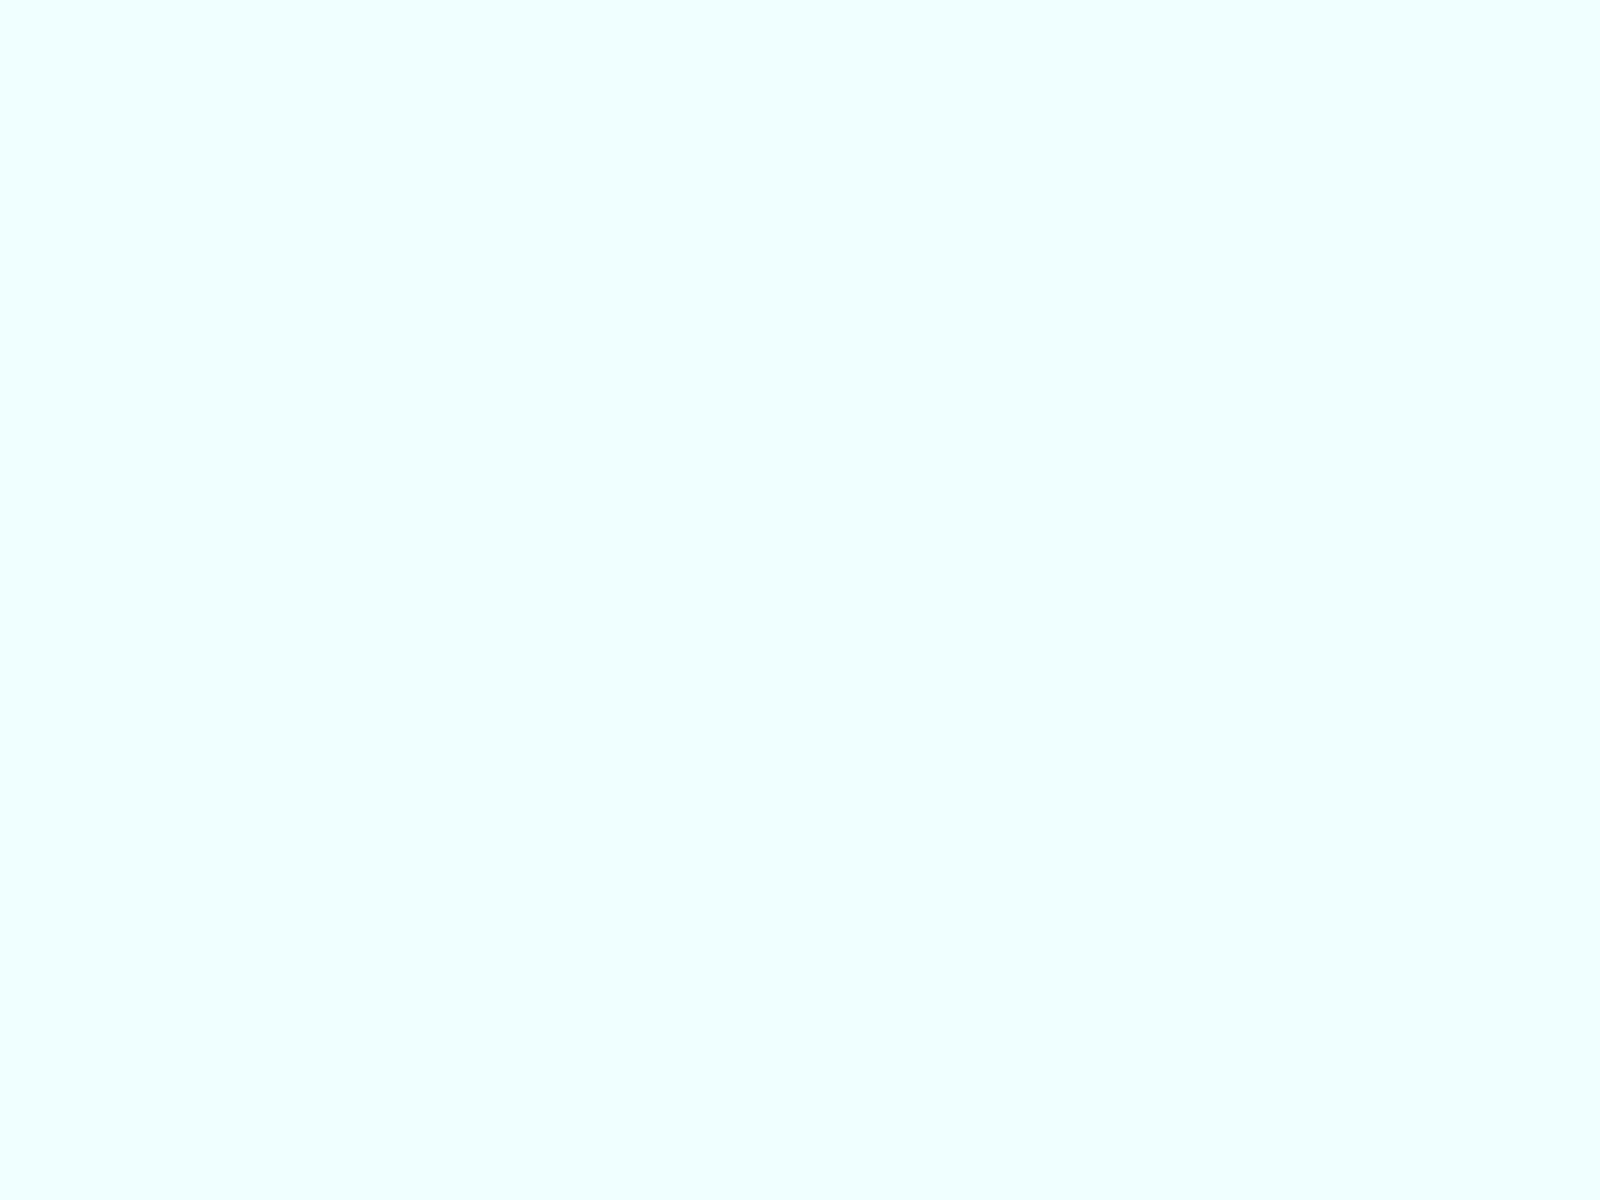 1600x1200 Azure Mist Solid Color Background